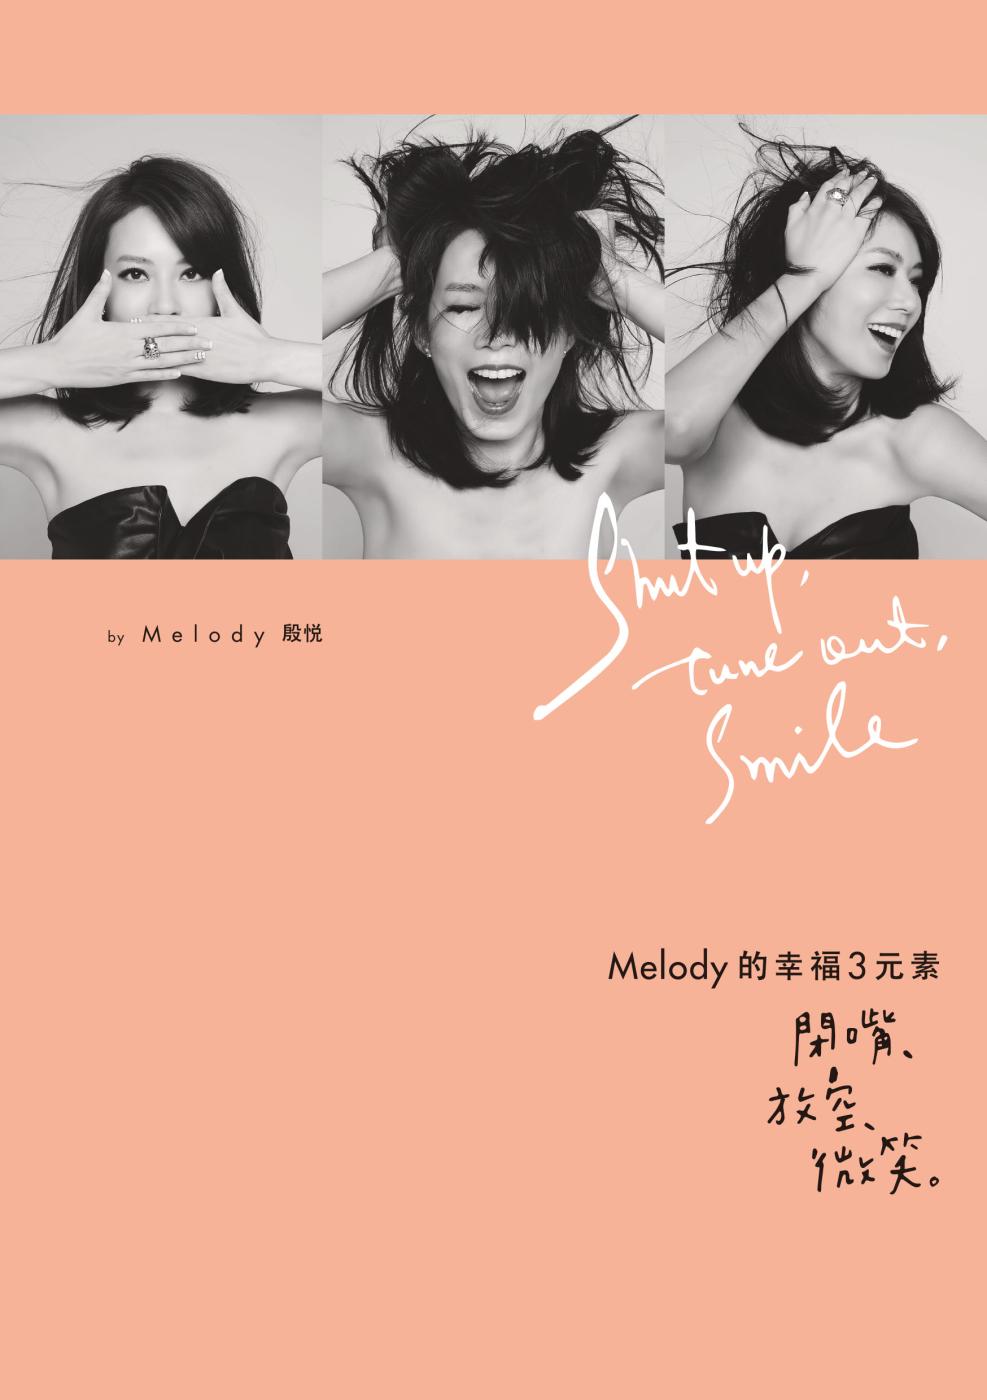 Melody的幸福3元素:閉嘴、放空、微笑